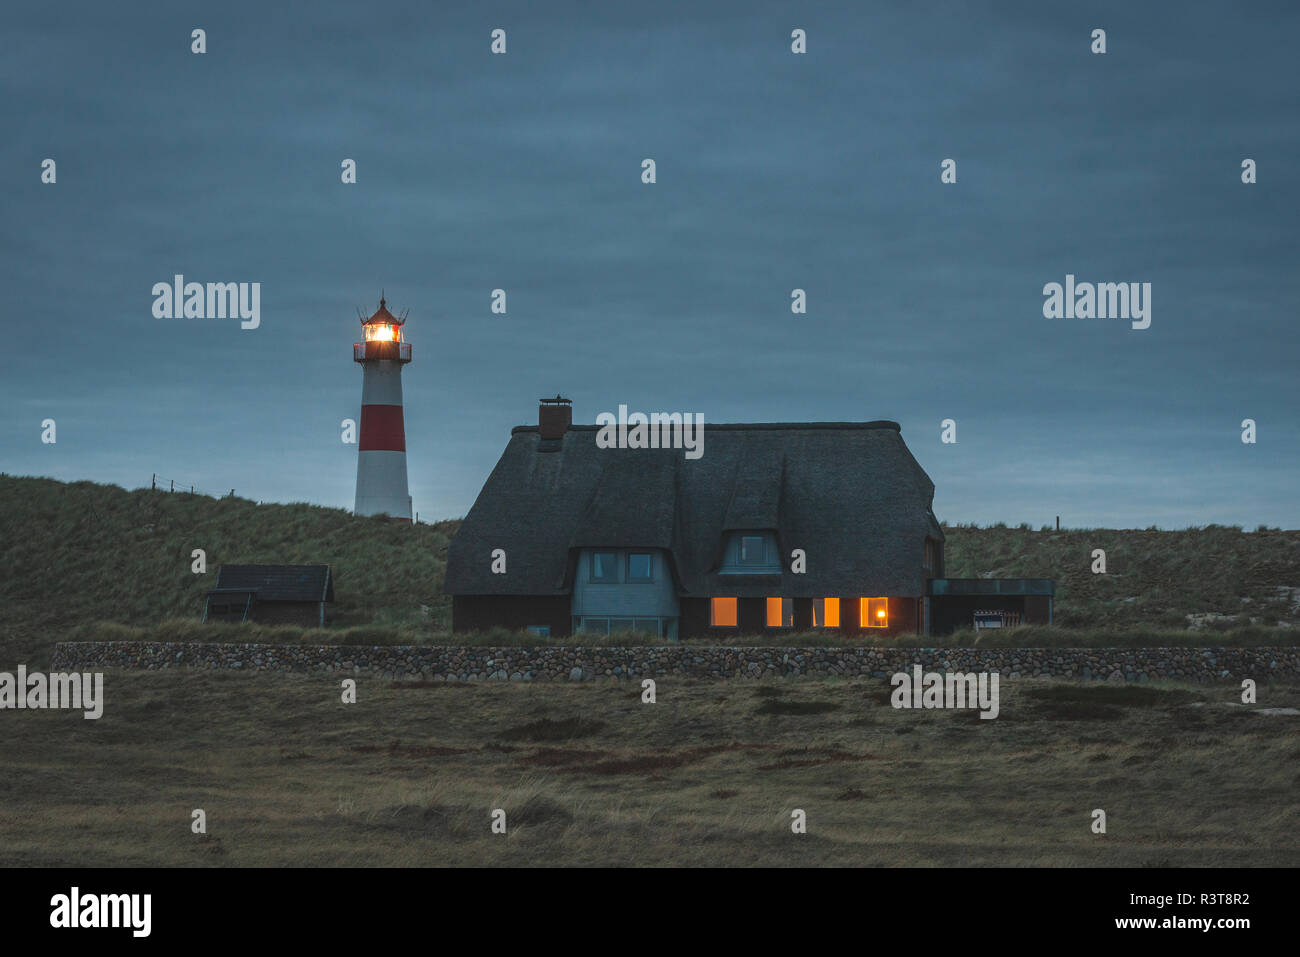 Germany, Schleswig-Holstein, Sylt, Ellenbogen, lighthouse List Ost in the evening - Stock Image